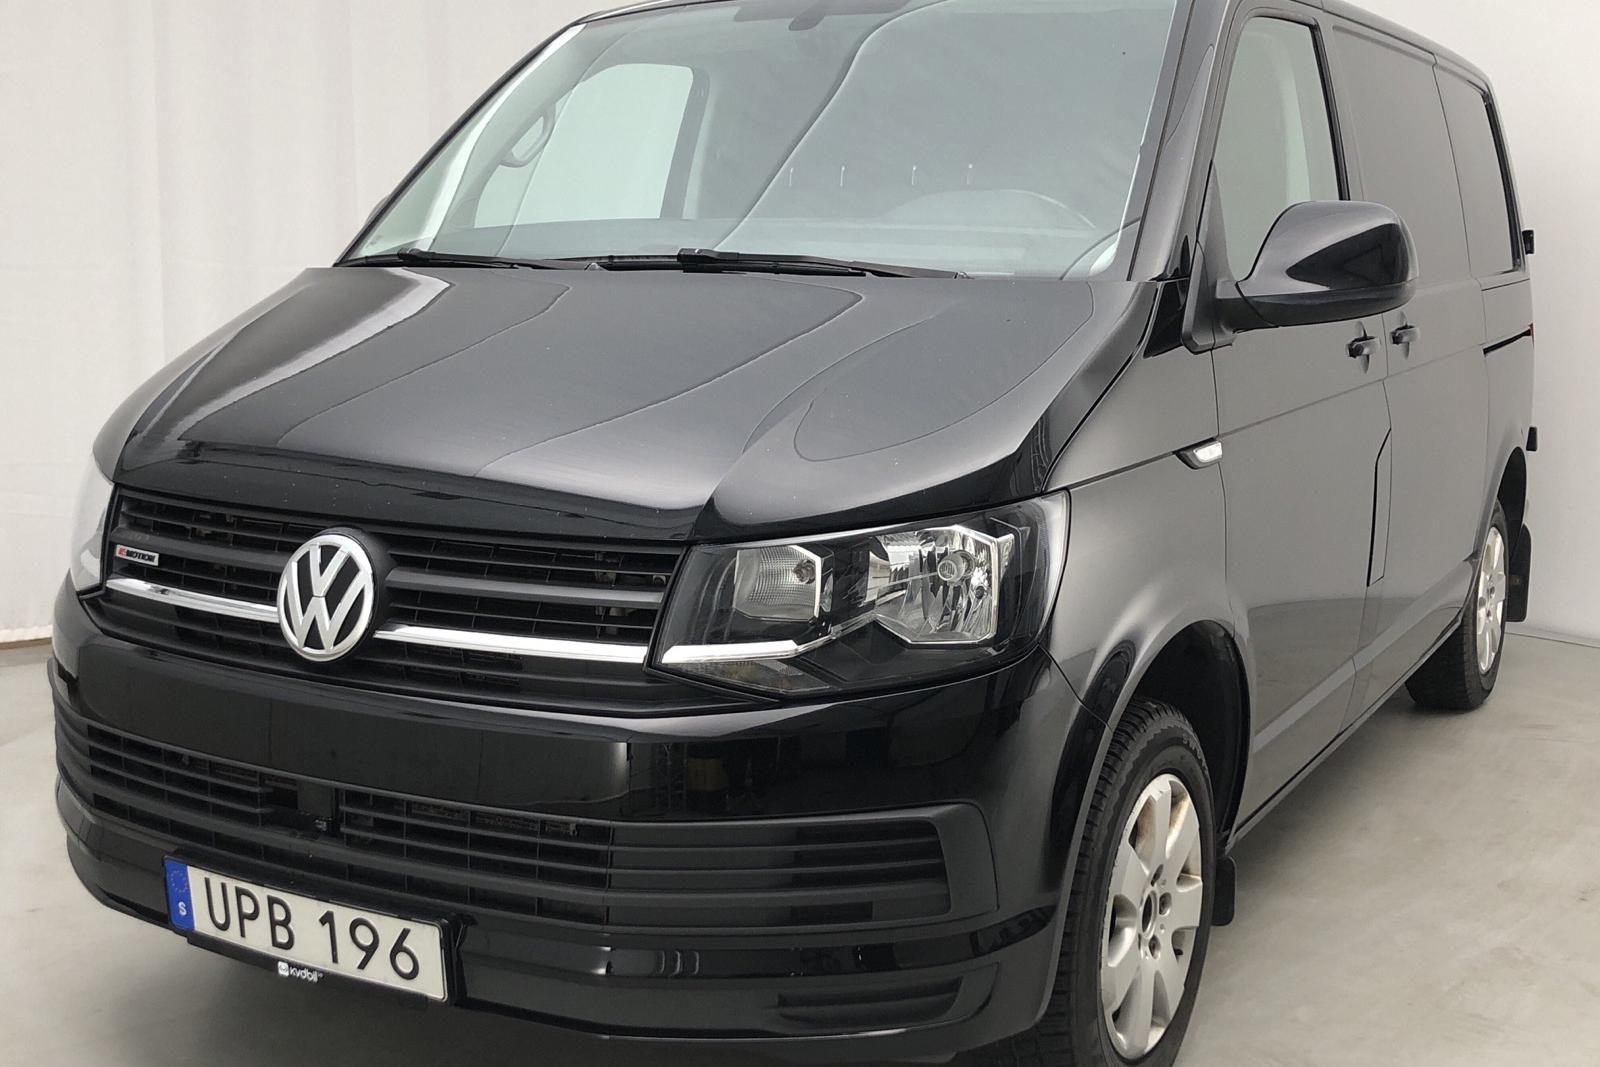 VW Transporter T6 2.0 TDI BMT Skåp 4MOTION (150Hk)